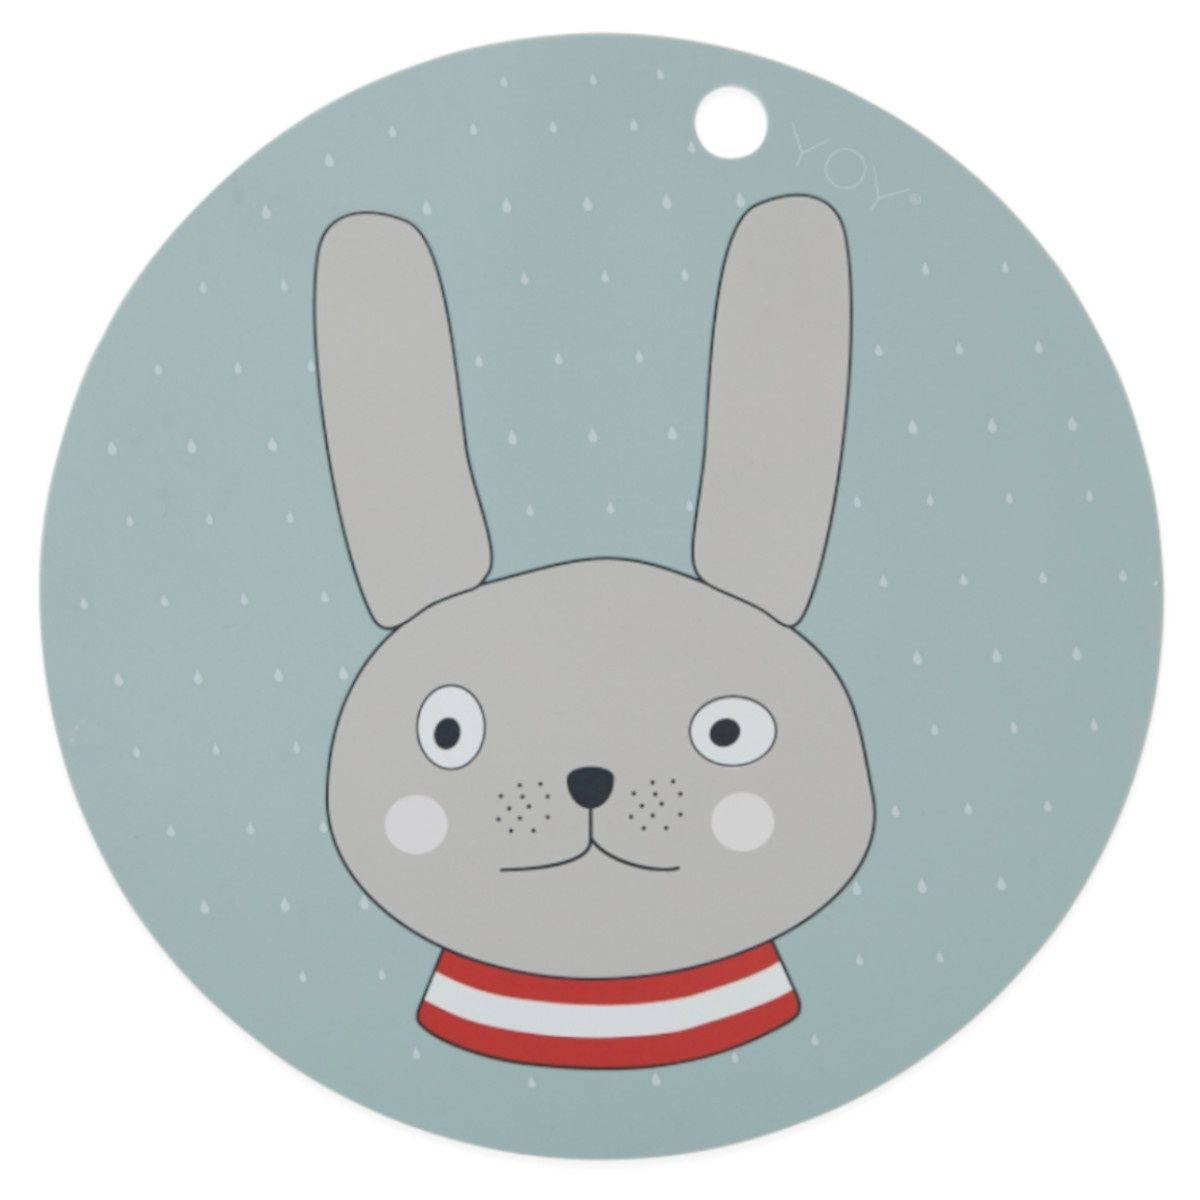 Podkładka pod talerz królik niebieska - OYOY